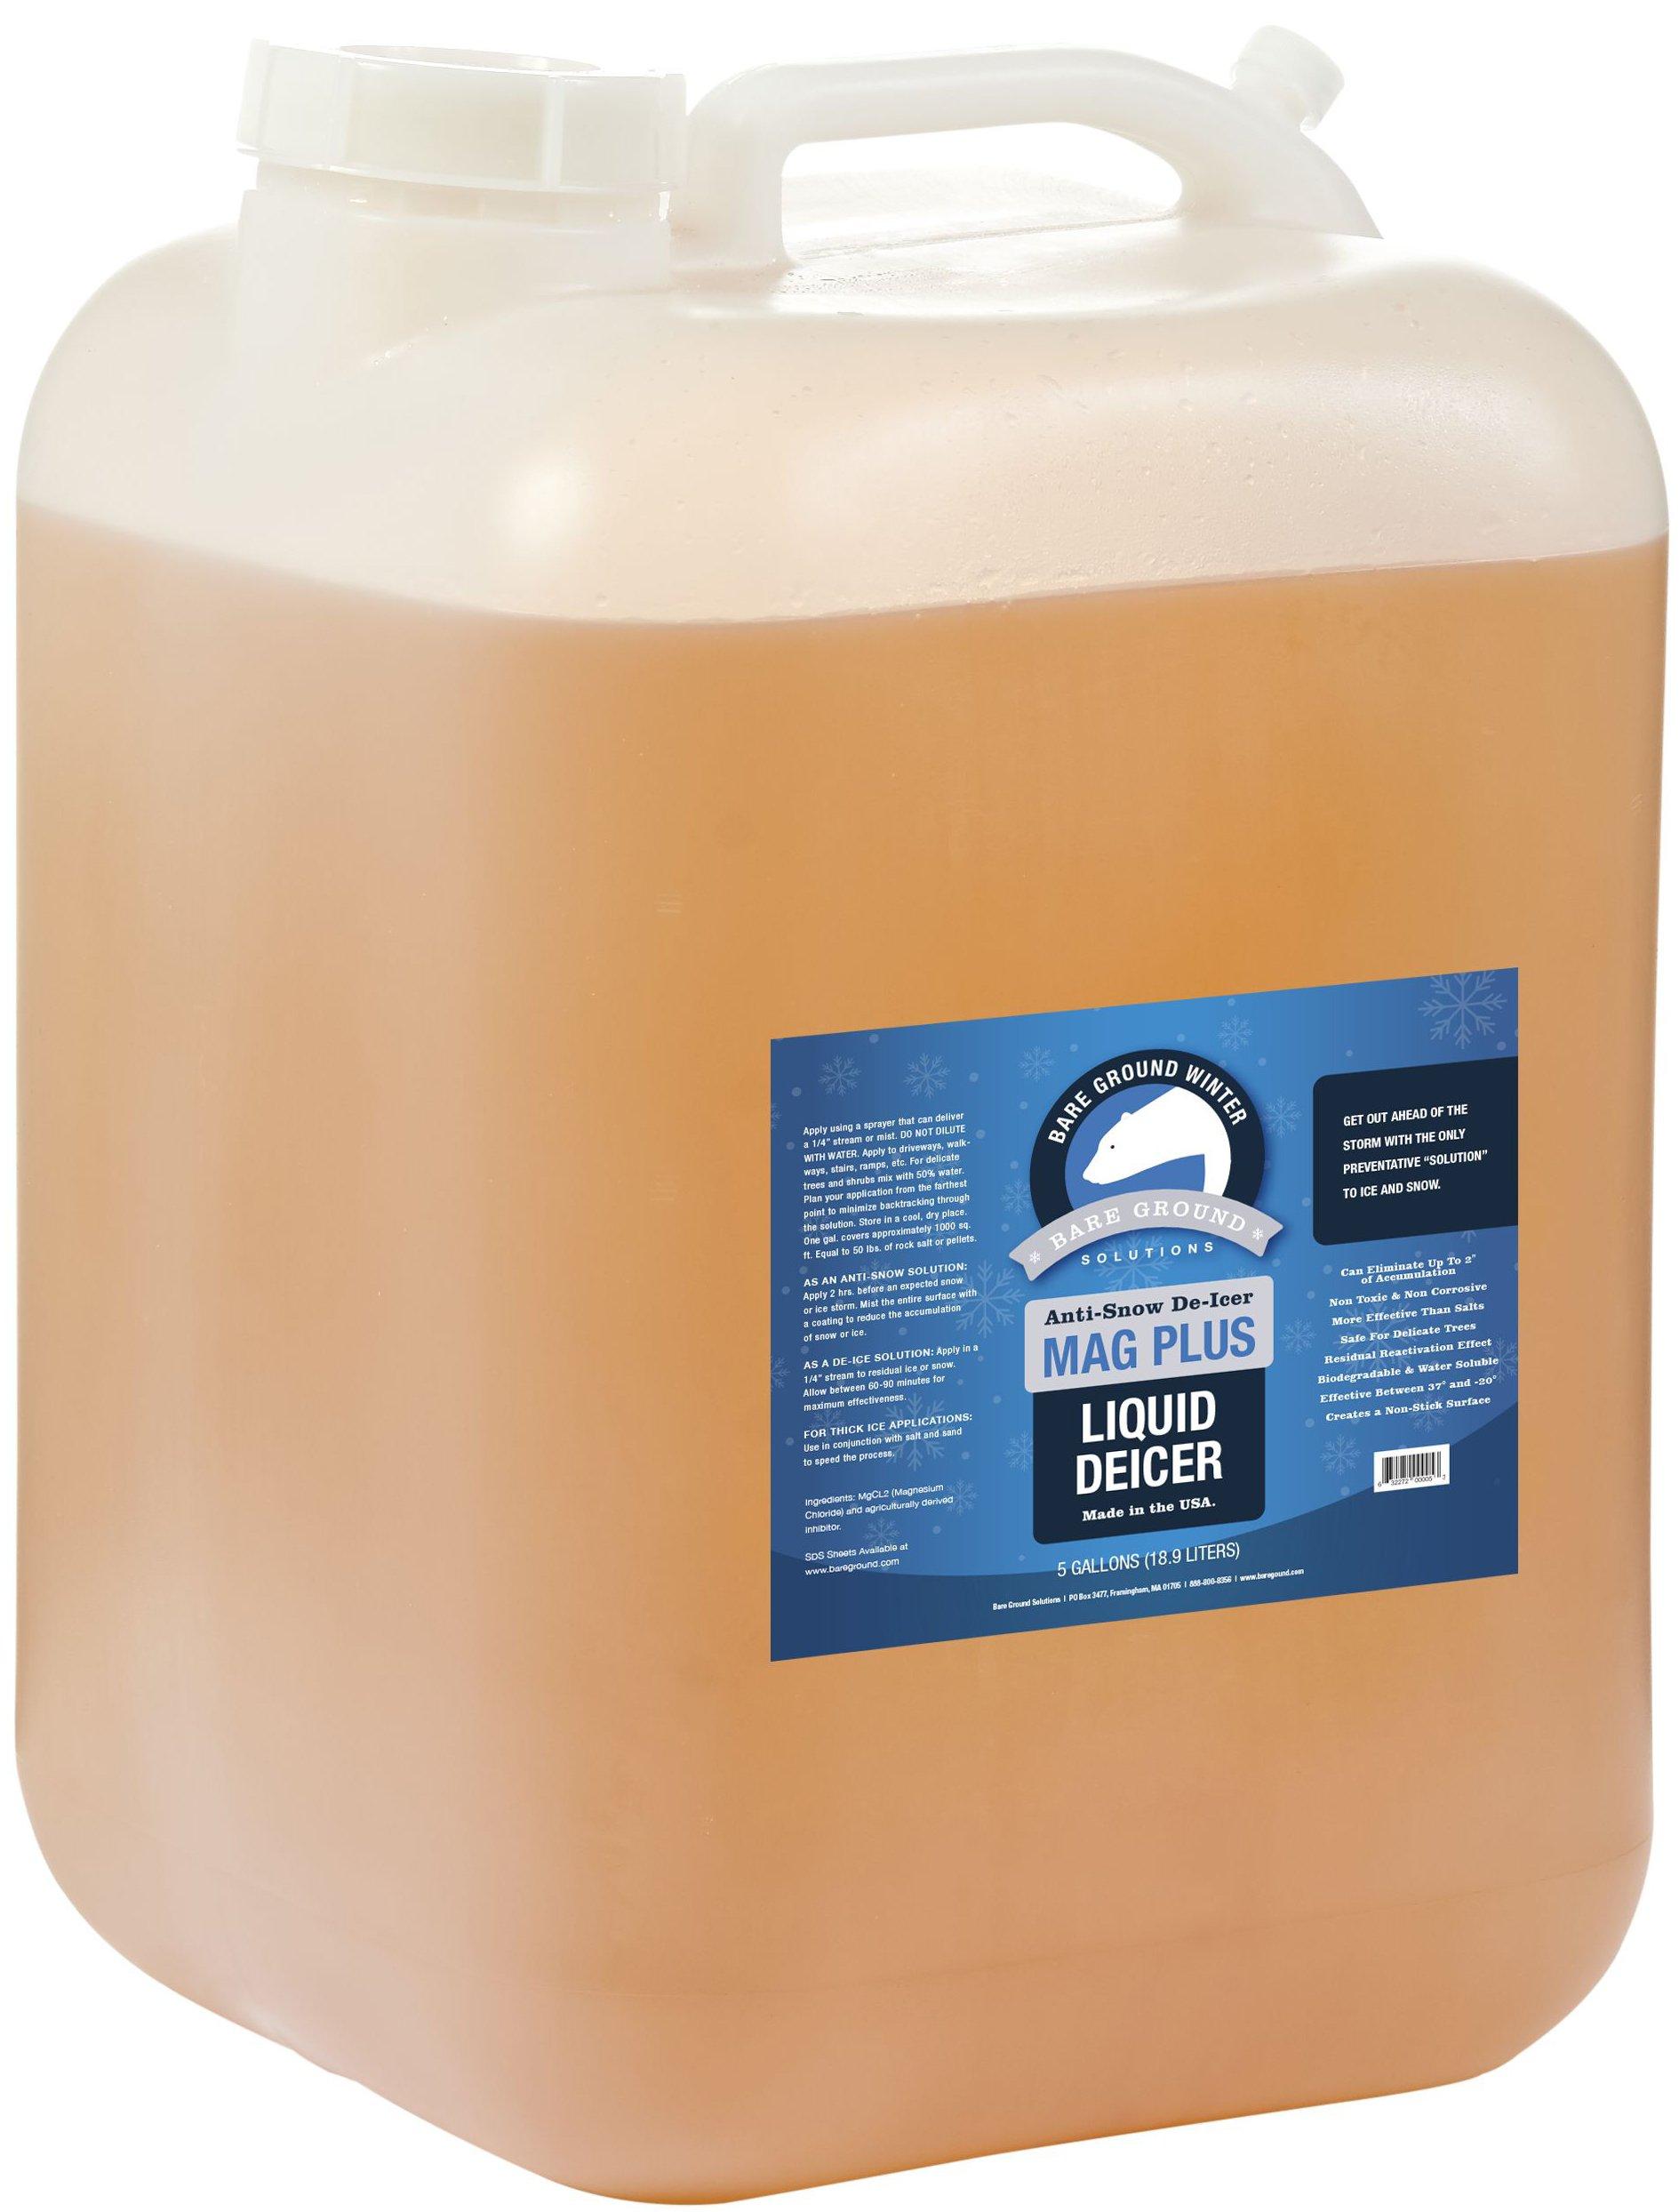 Bare Ground BG-5P All Natural Anti-Snow Liquid De-Icer, 640 oz (5 Gallons)